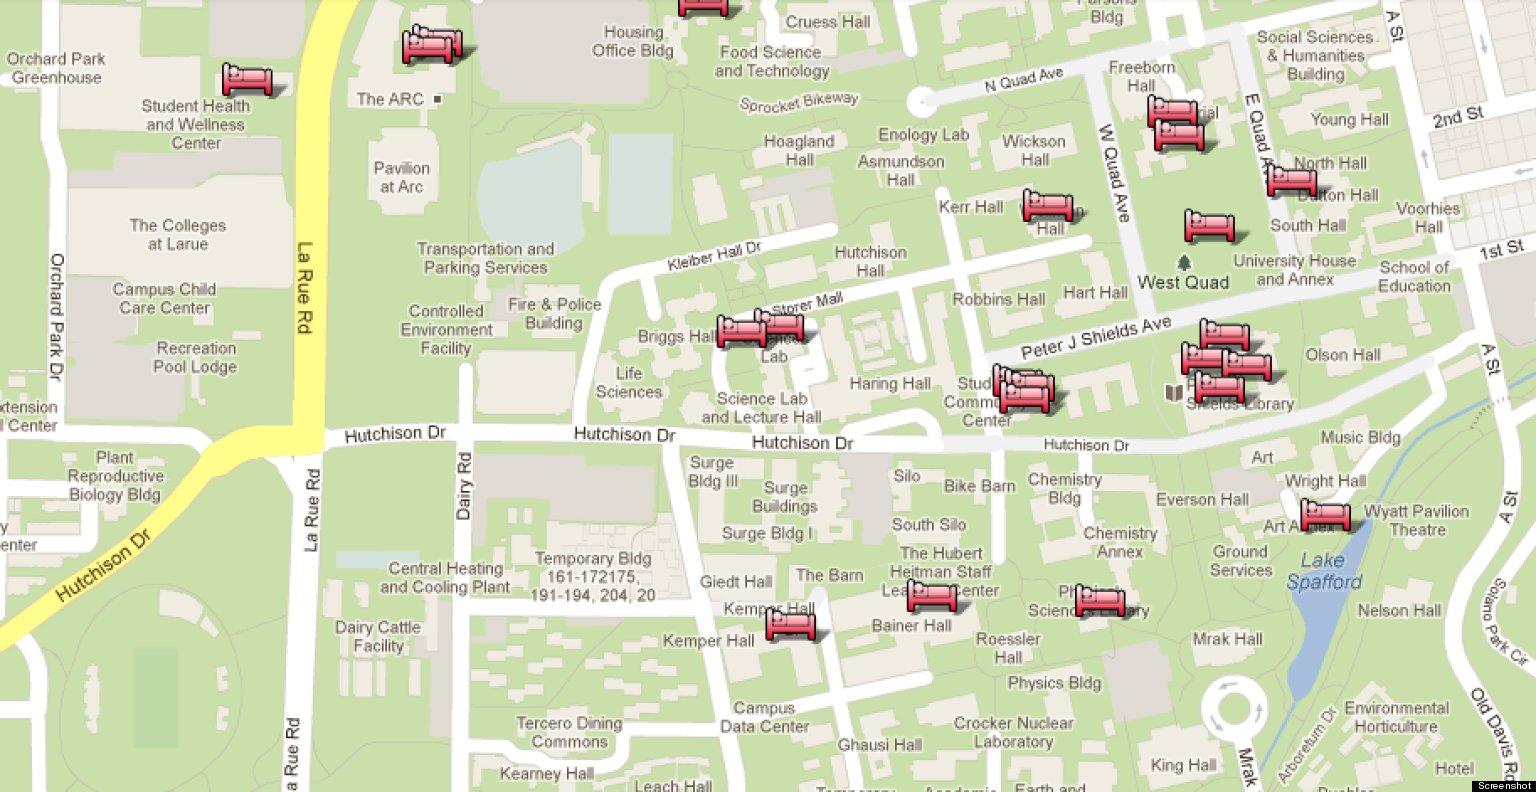 UC Davis Google Map Shows Best Nap Spots On Campus (PHOTO) Uc Davis Campus Map